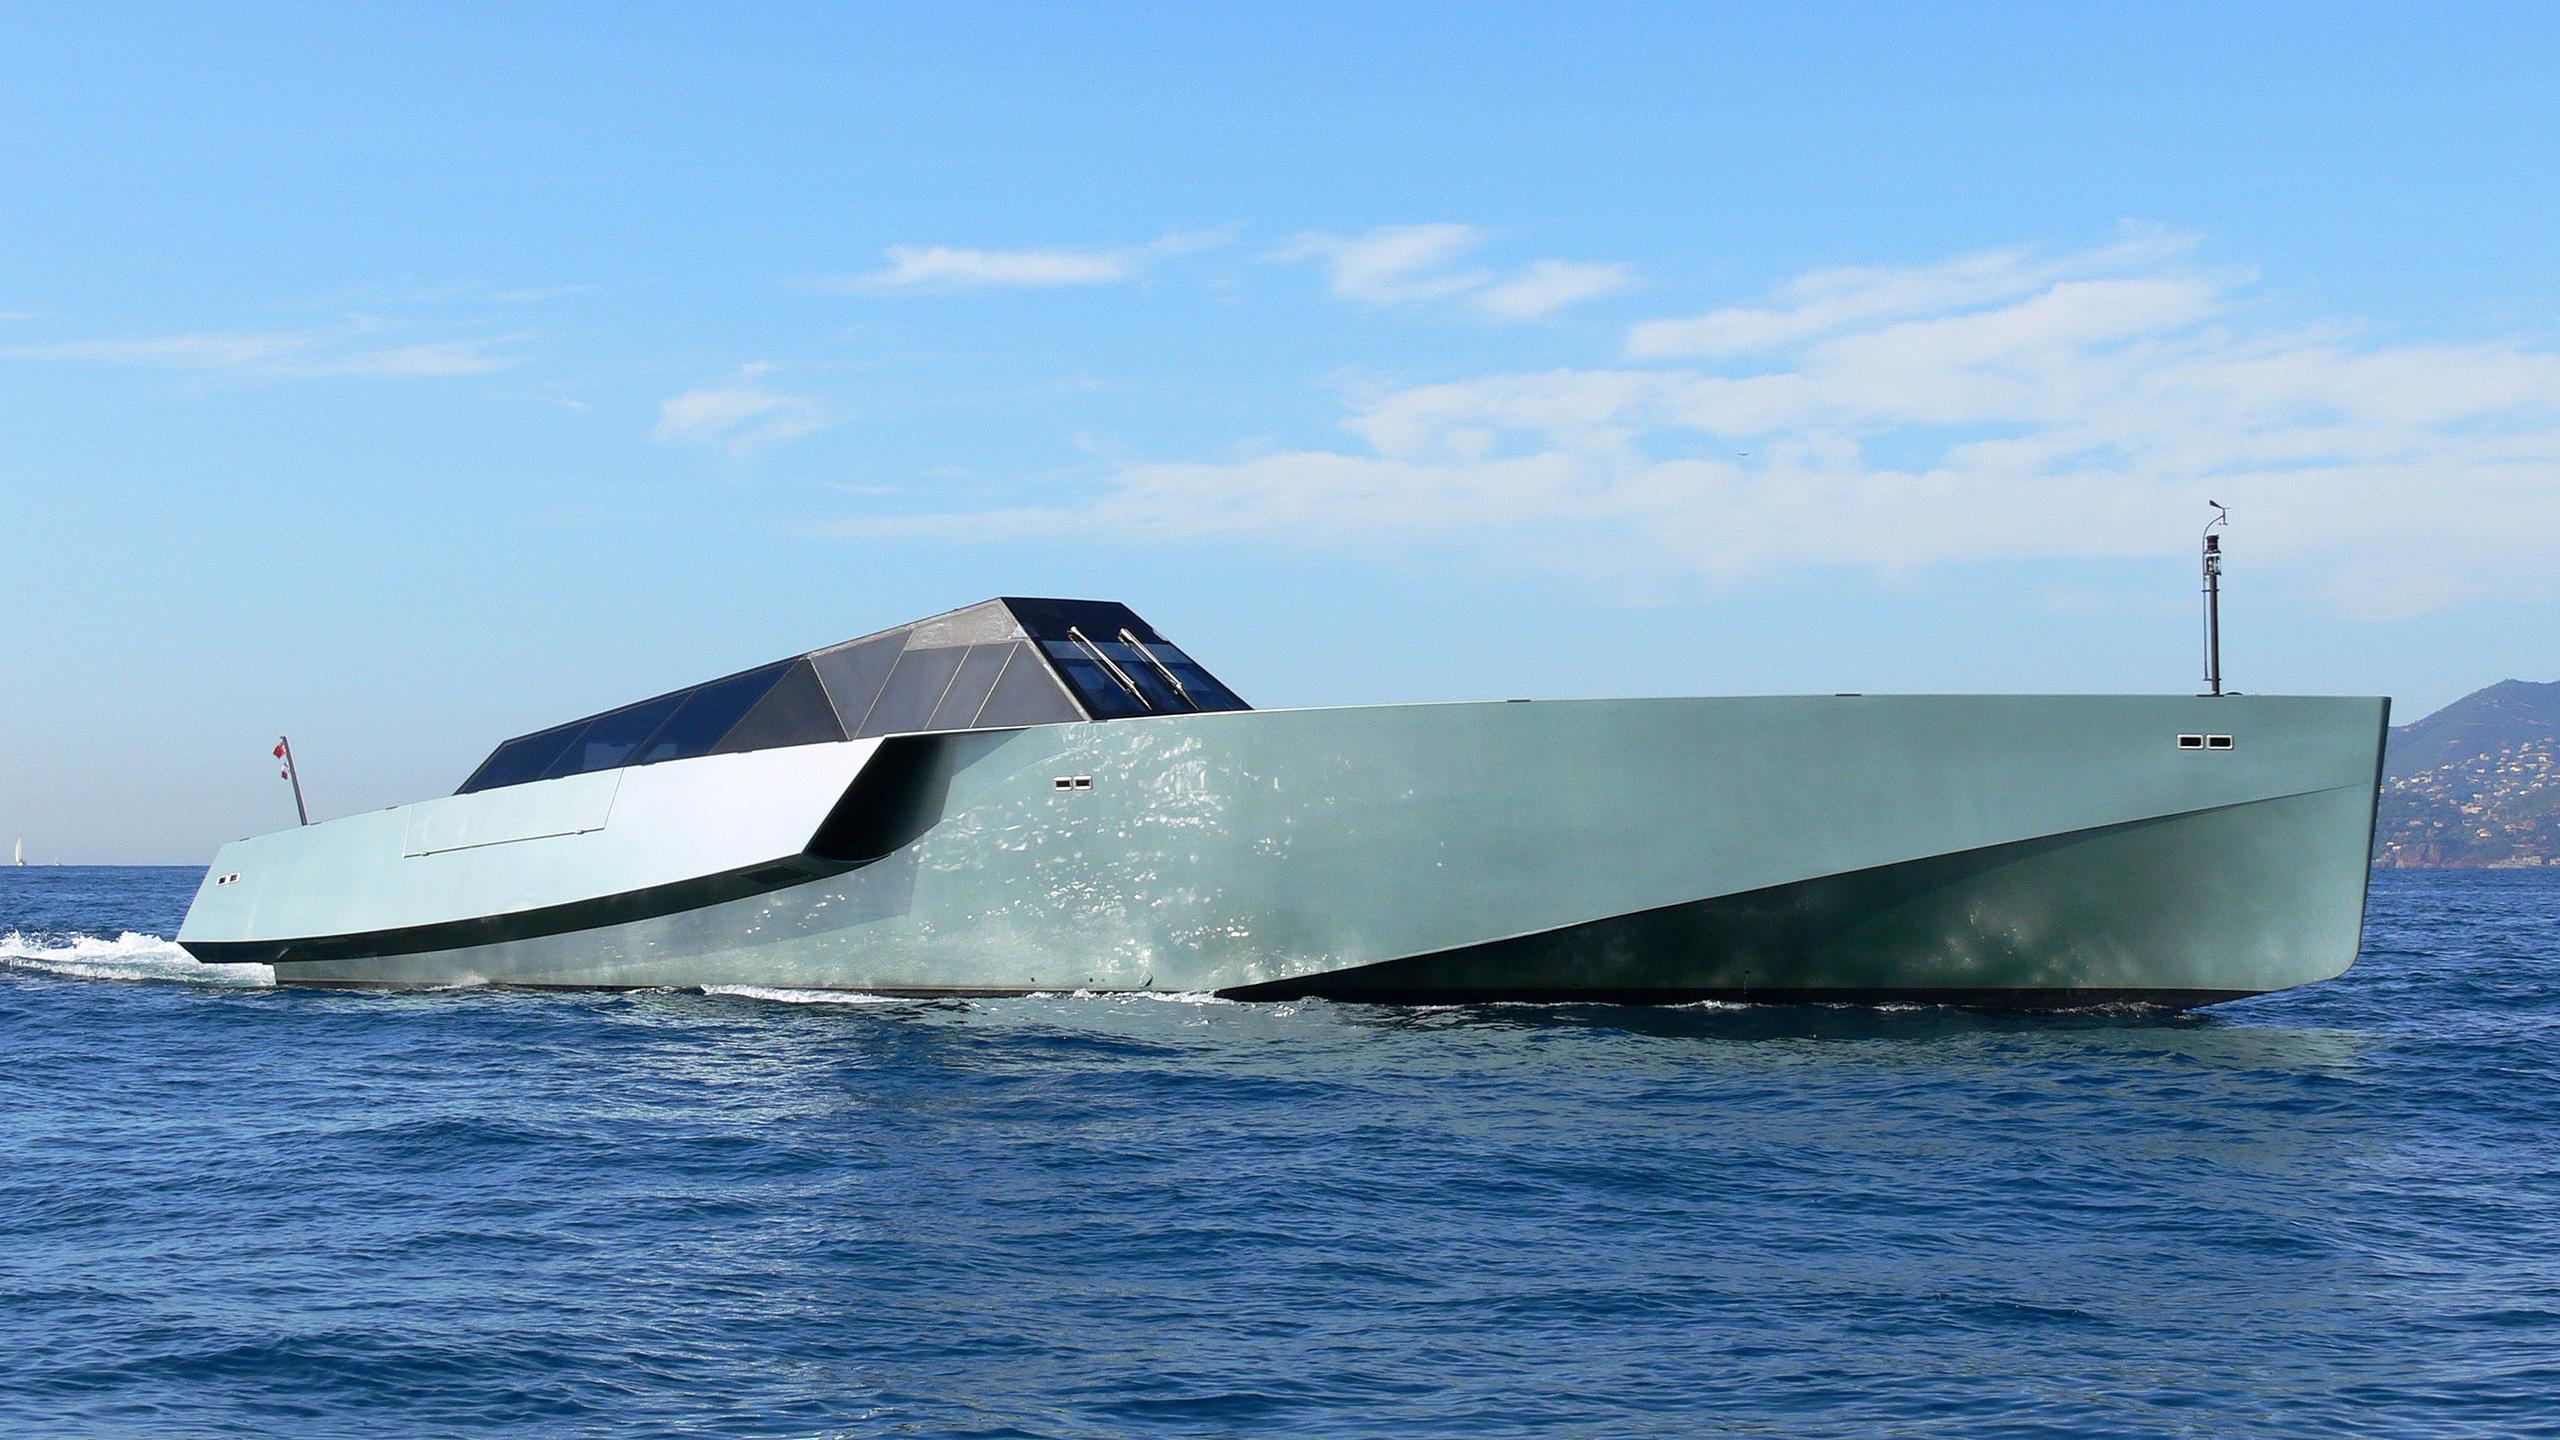 galeocerdo-yacht-exterior